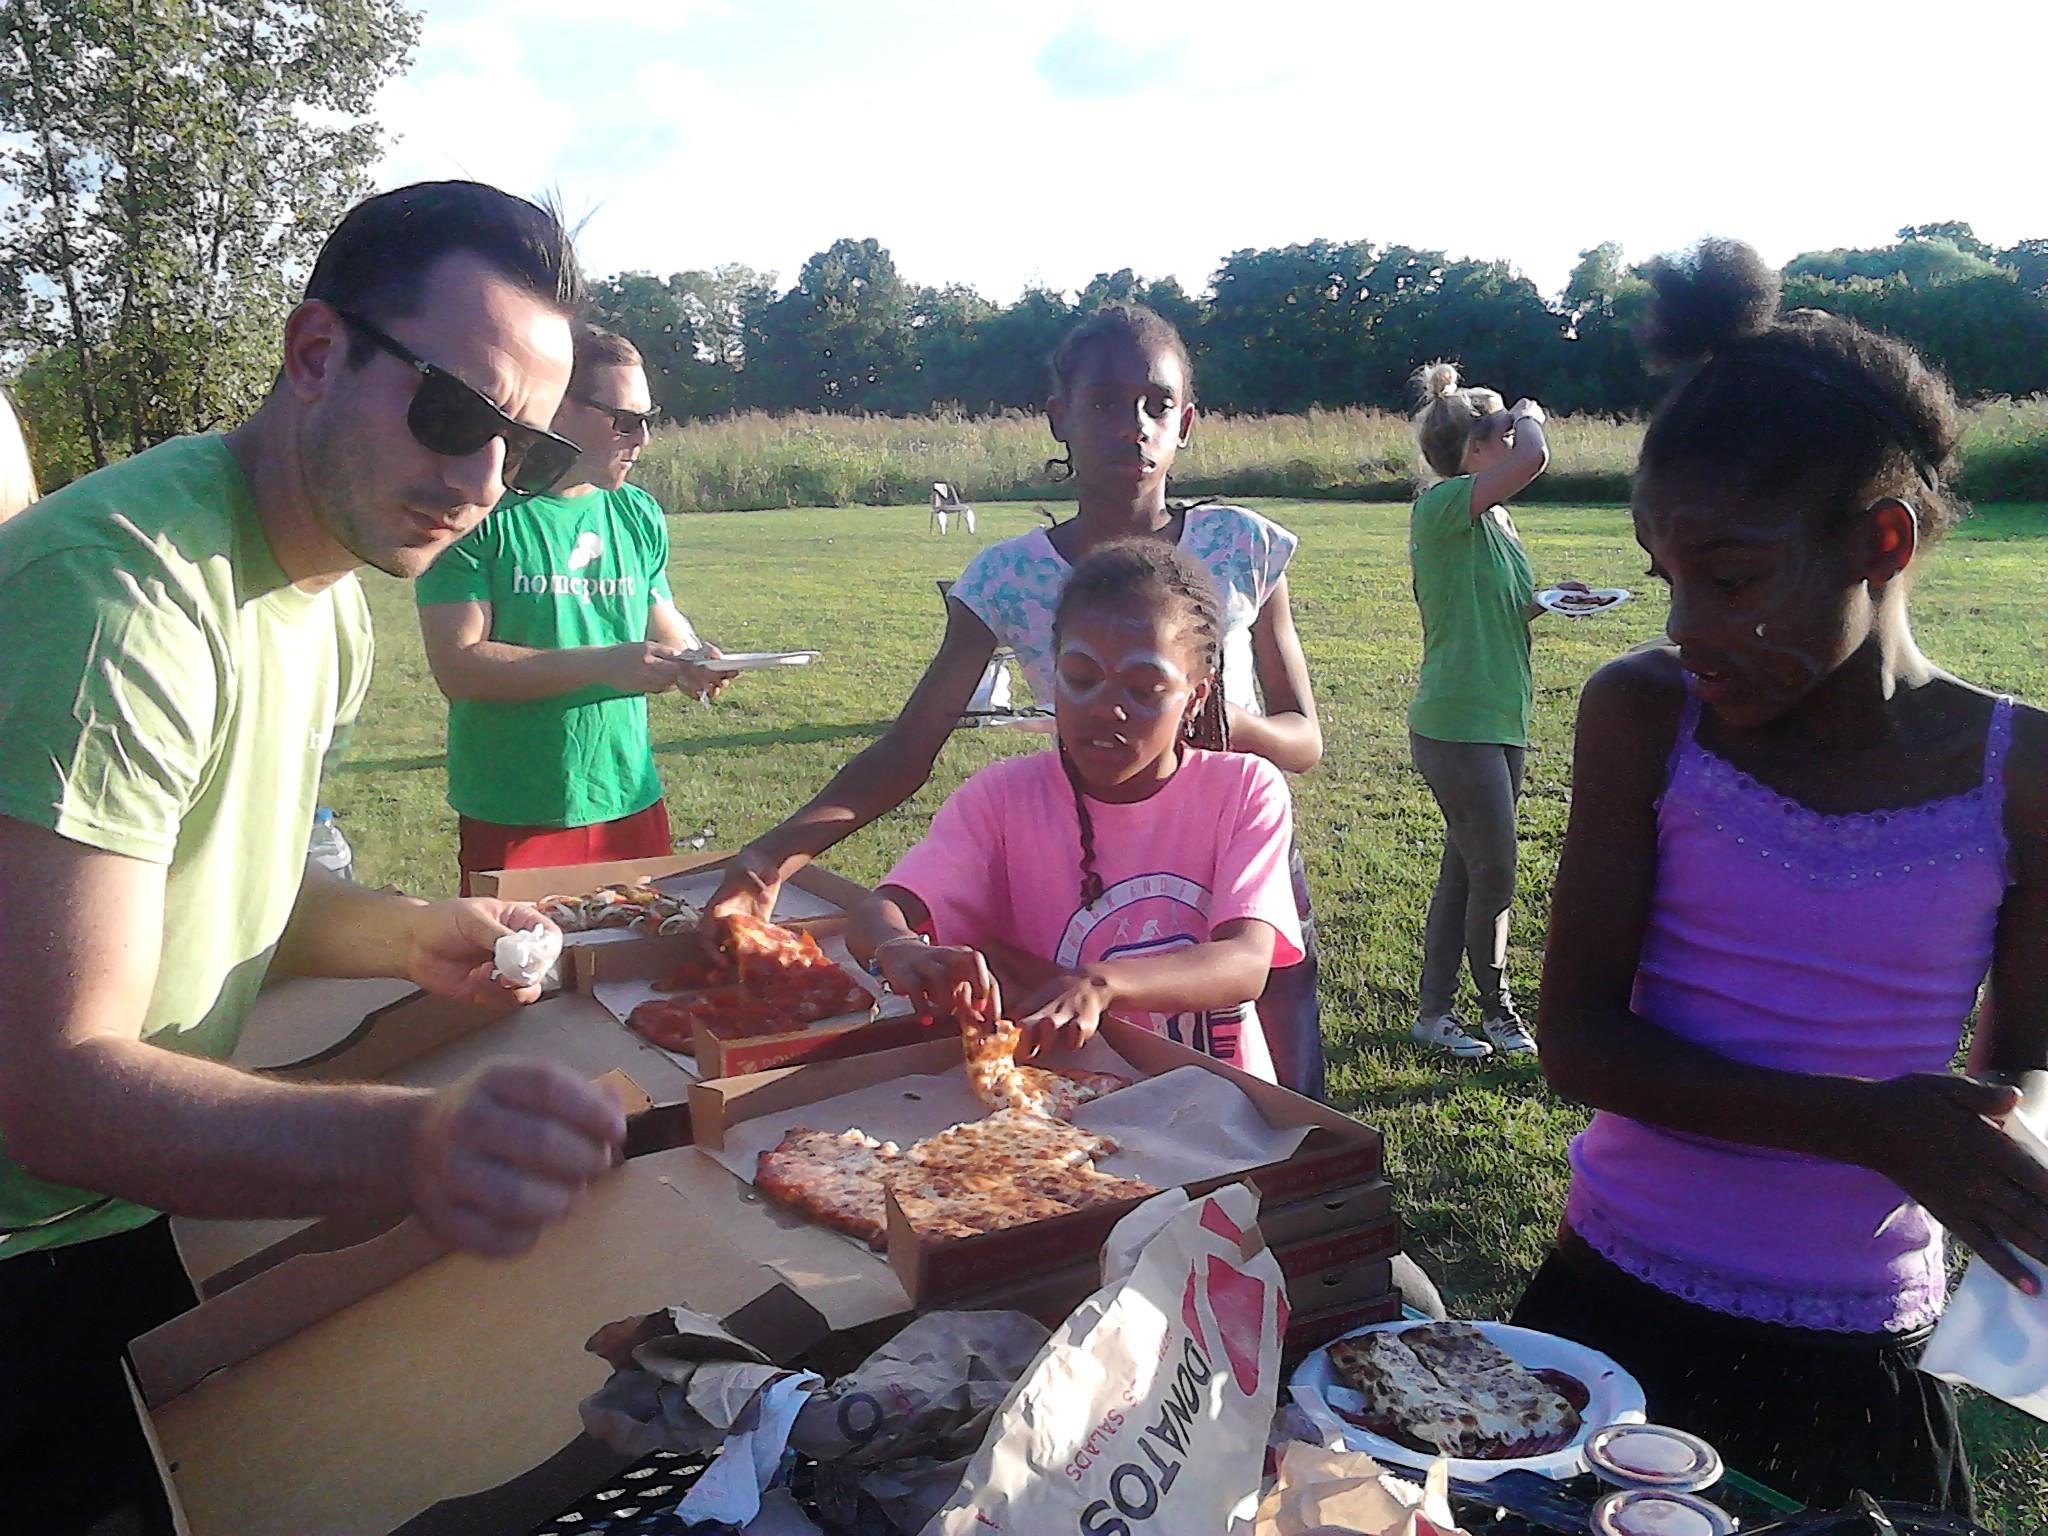 Dr. Josh Grosshandler dishes up pizza